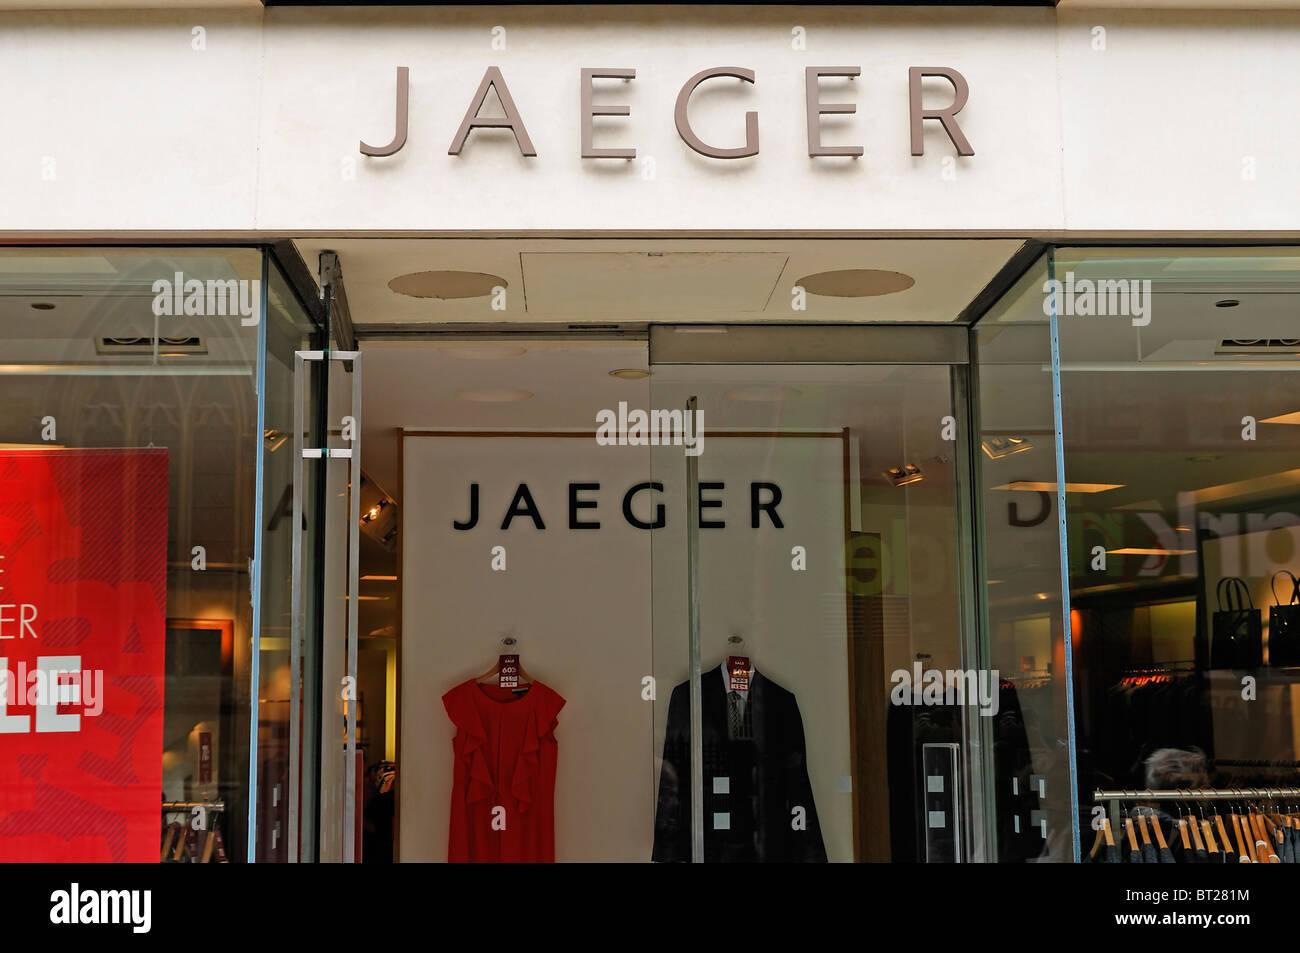 Jaeger Clothes Shop, Oxford, UK. - Stock Image